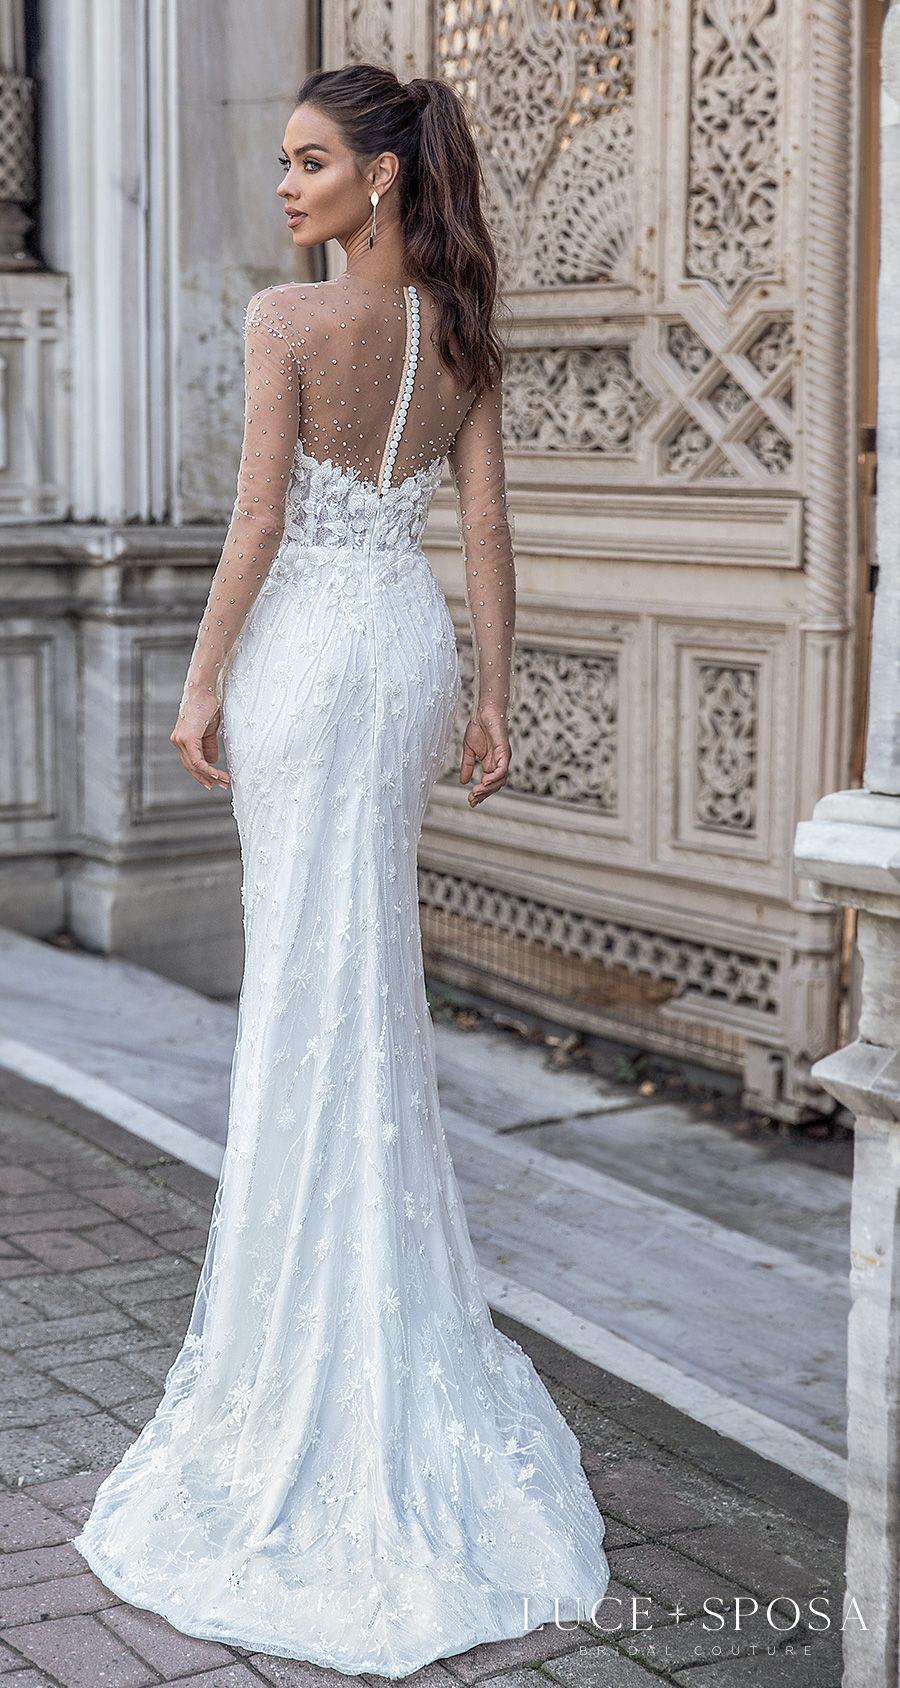 luce sposa s2021 istanbul bridal sheer long sleeves illusion jewel sweetheart neckline full embellishment elegant sheath wedding dress sheer button back sweep train (amara) bv